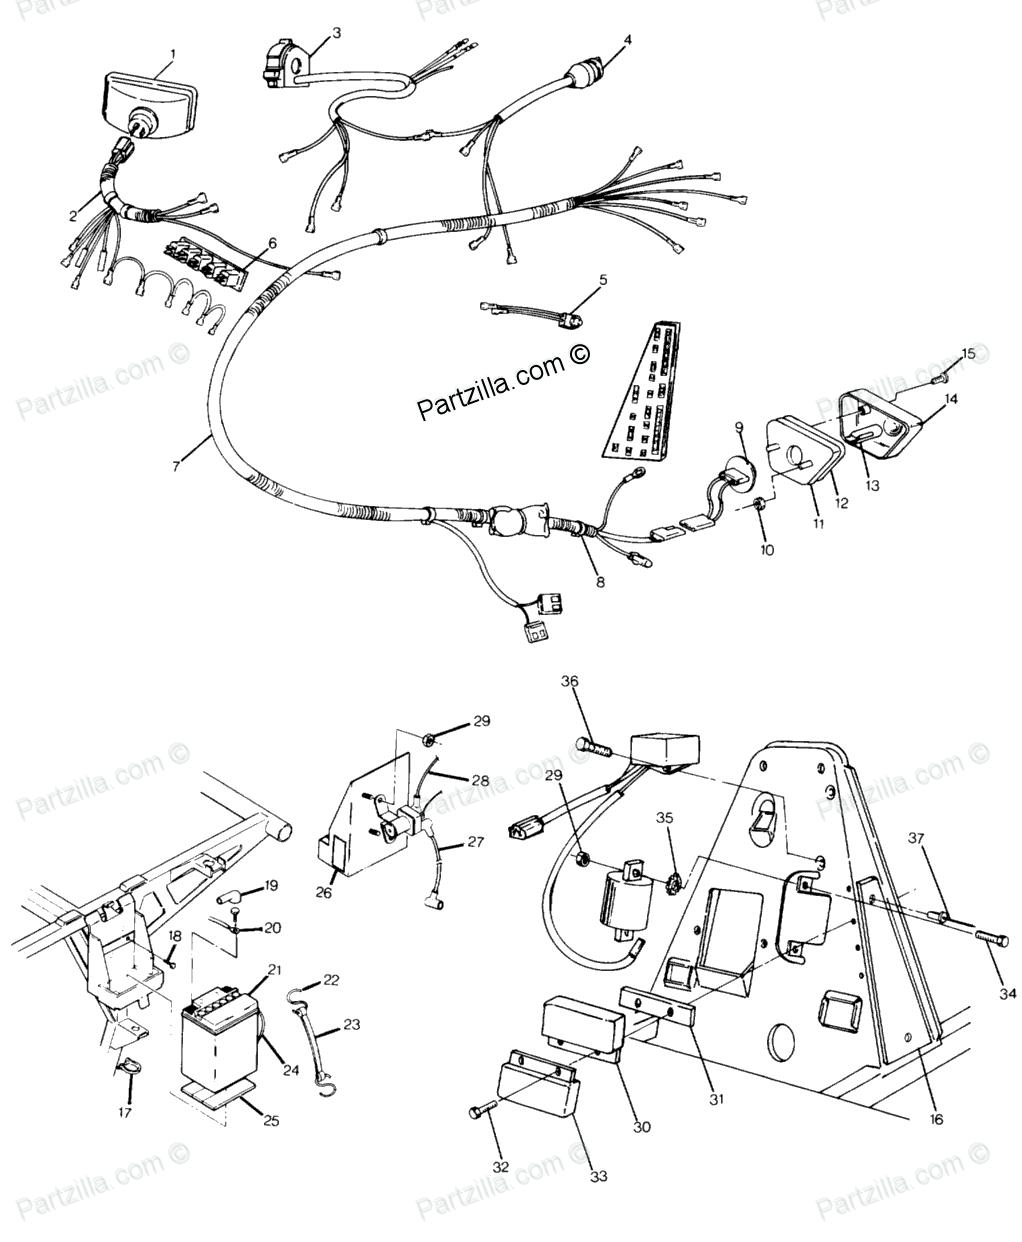 Awesome polaris trail boss wiring kohler ch20s wiring diagram jayco